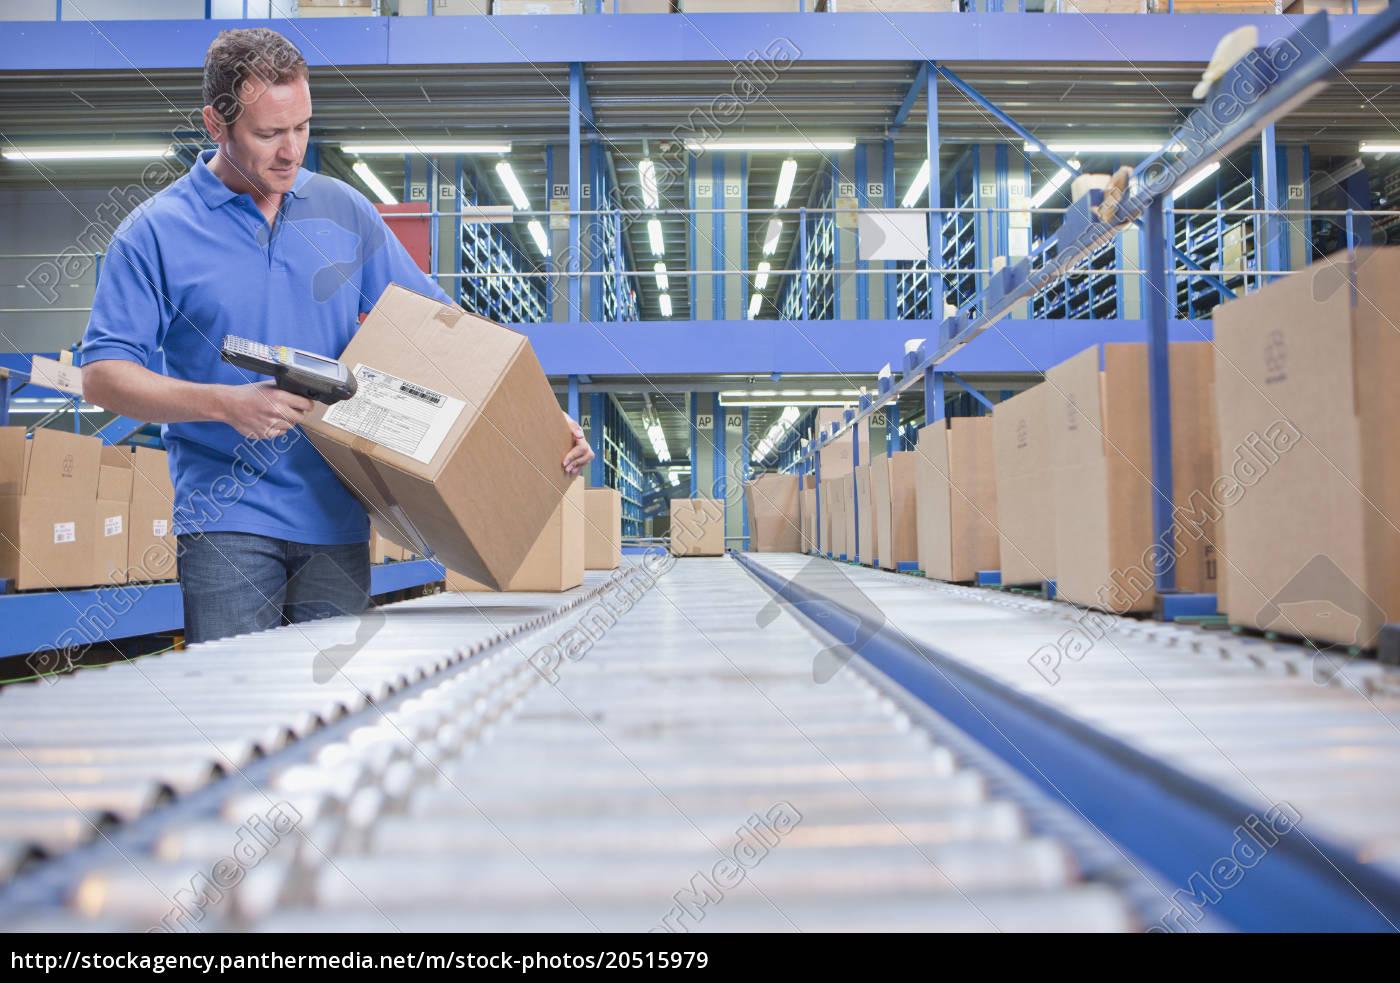 worker, using, scanner, in, warehouse, despatch - 20515979